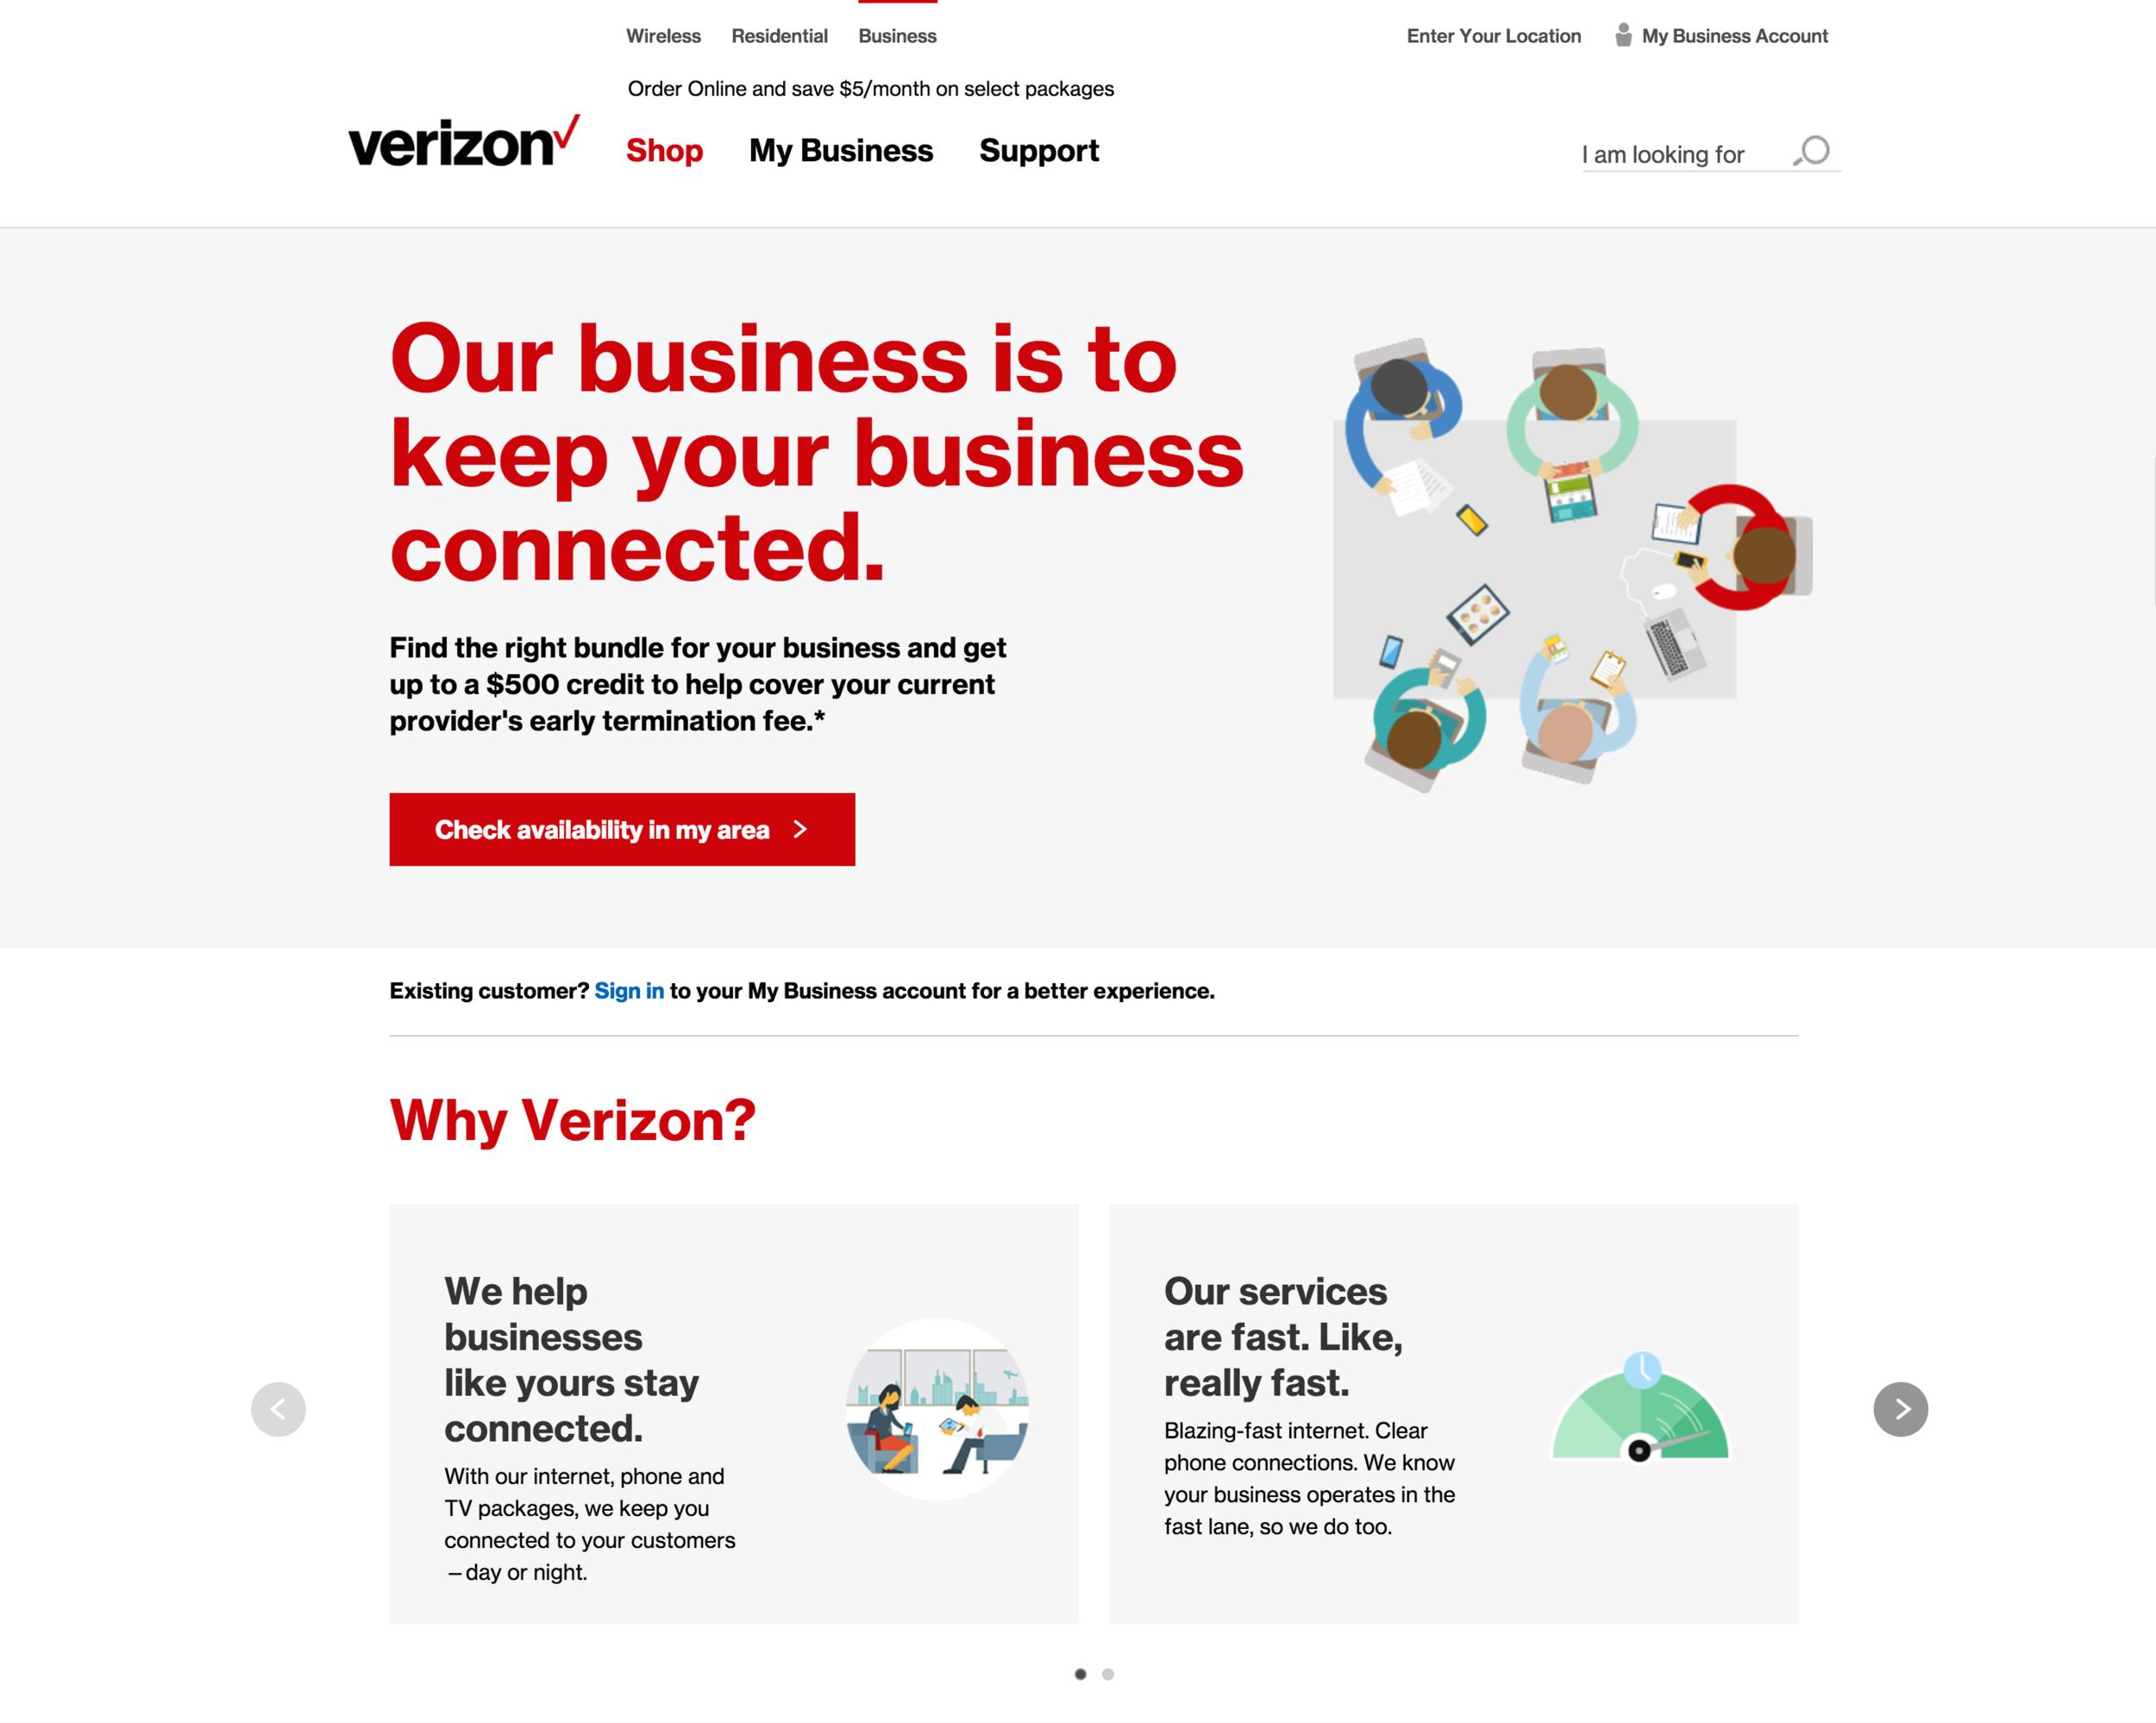 Verizon — Jane Yoon